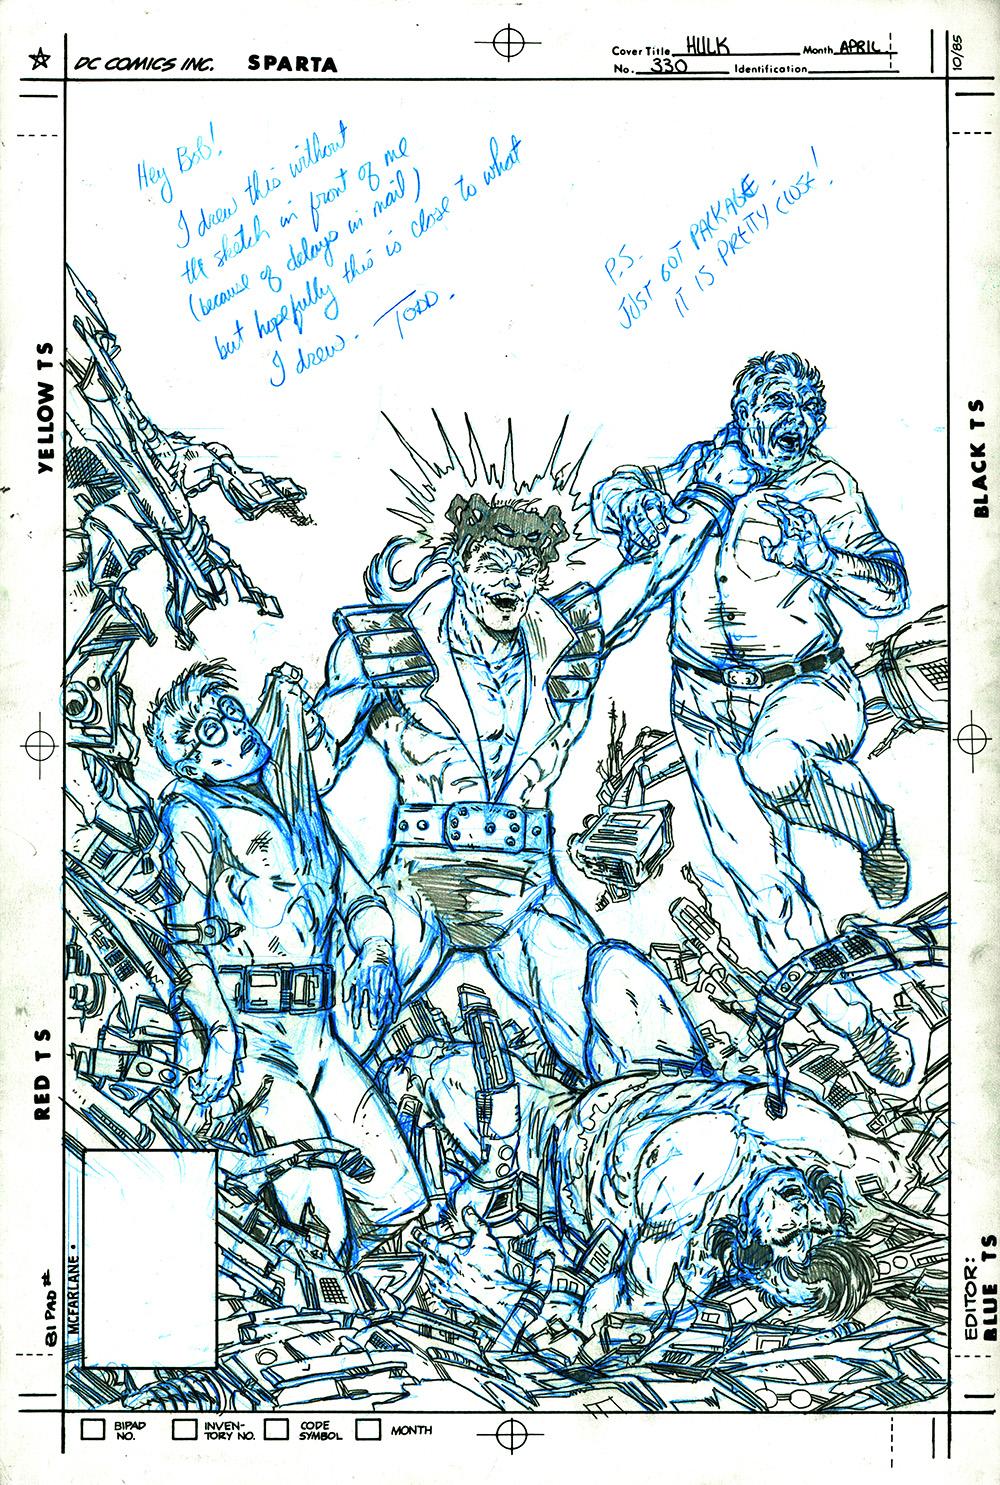 Hulk_330_cover_sketch_2 copy